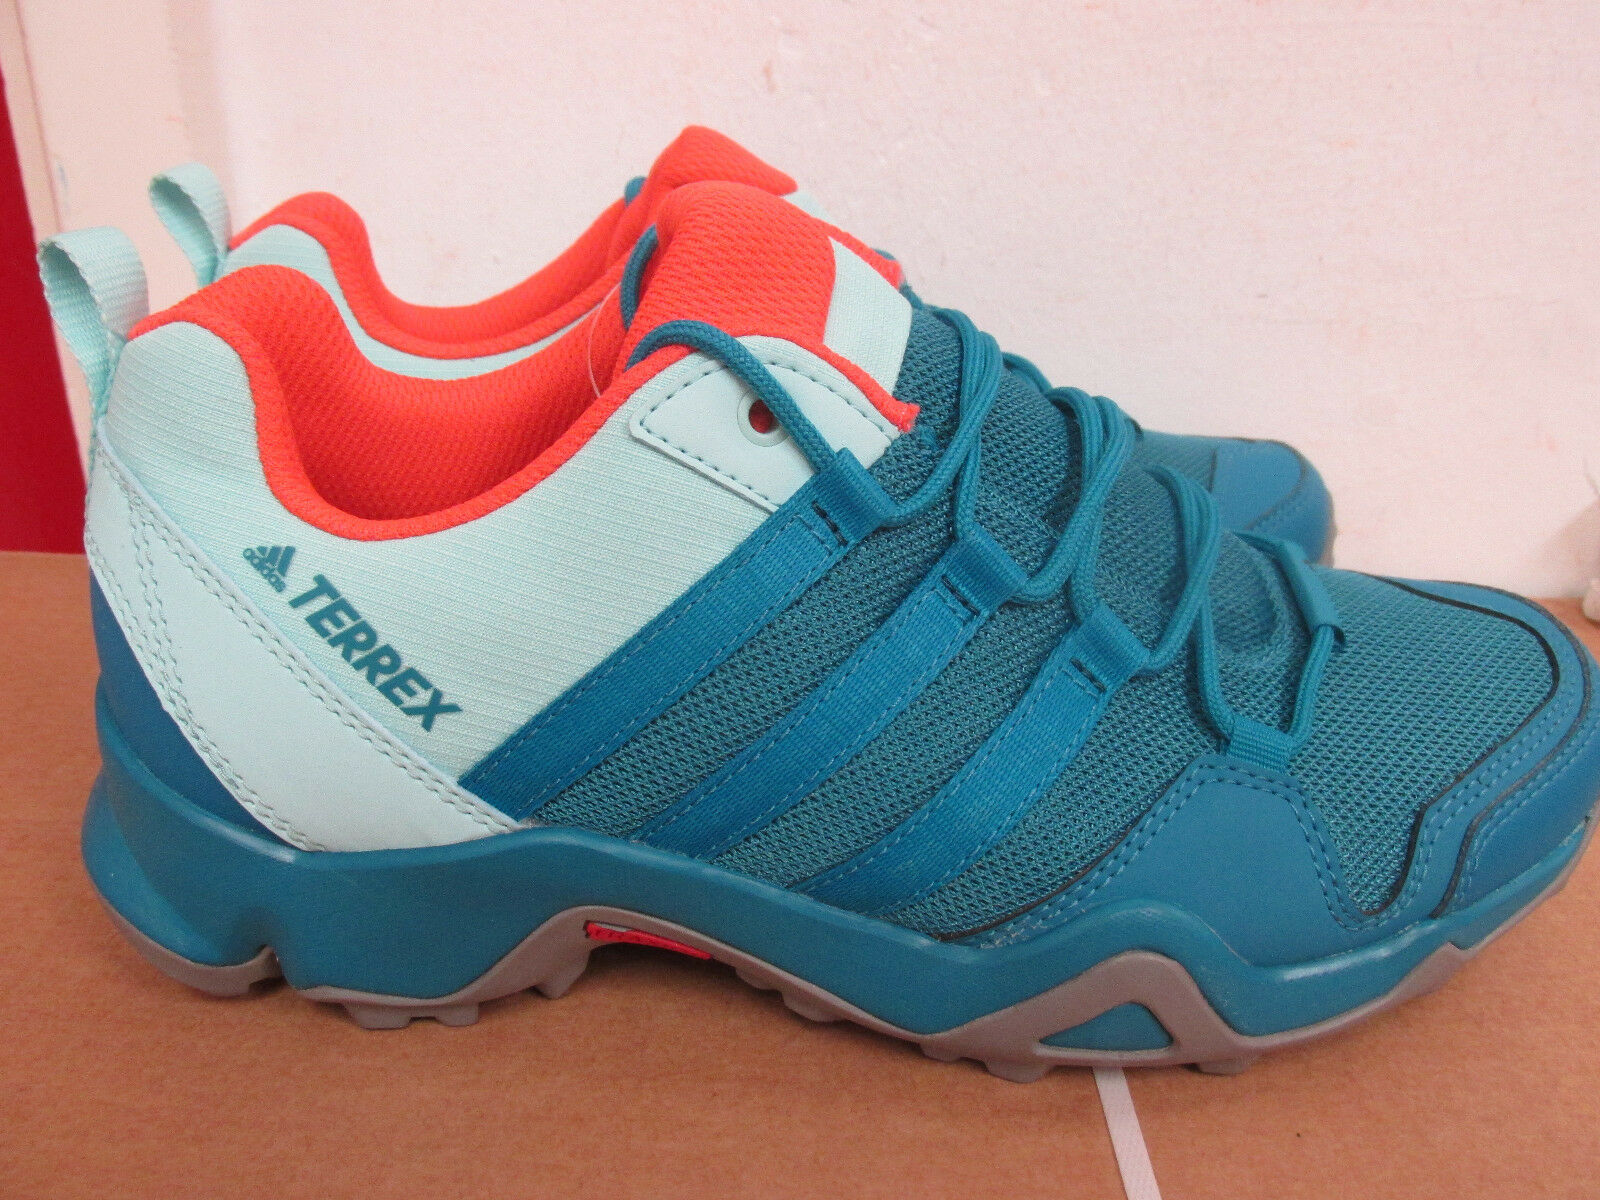 Adidas Terrex Ax2r W S80915 Femmes Baskets Échantillon